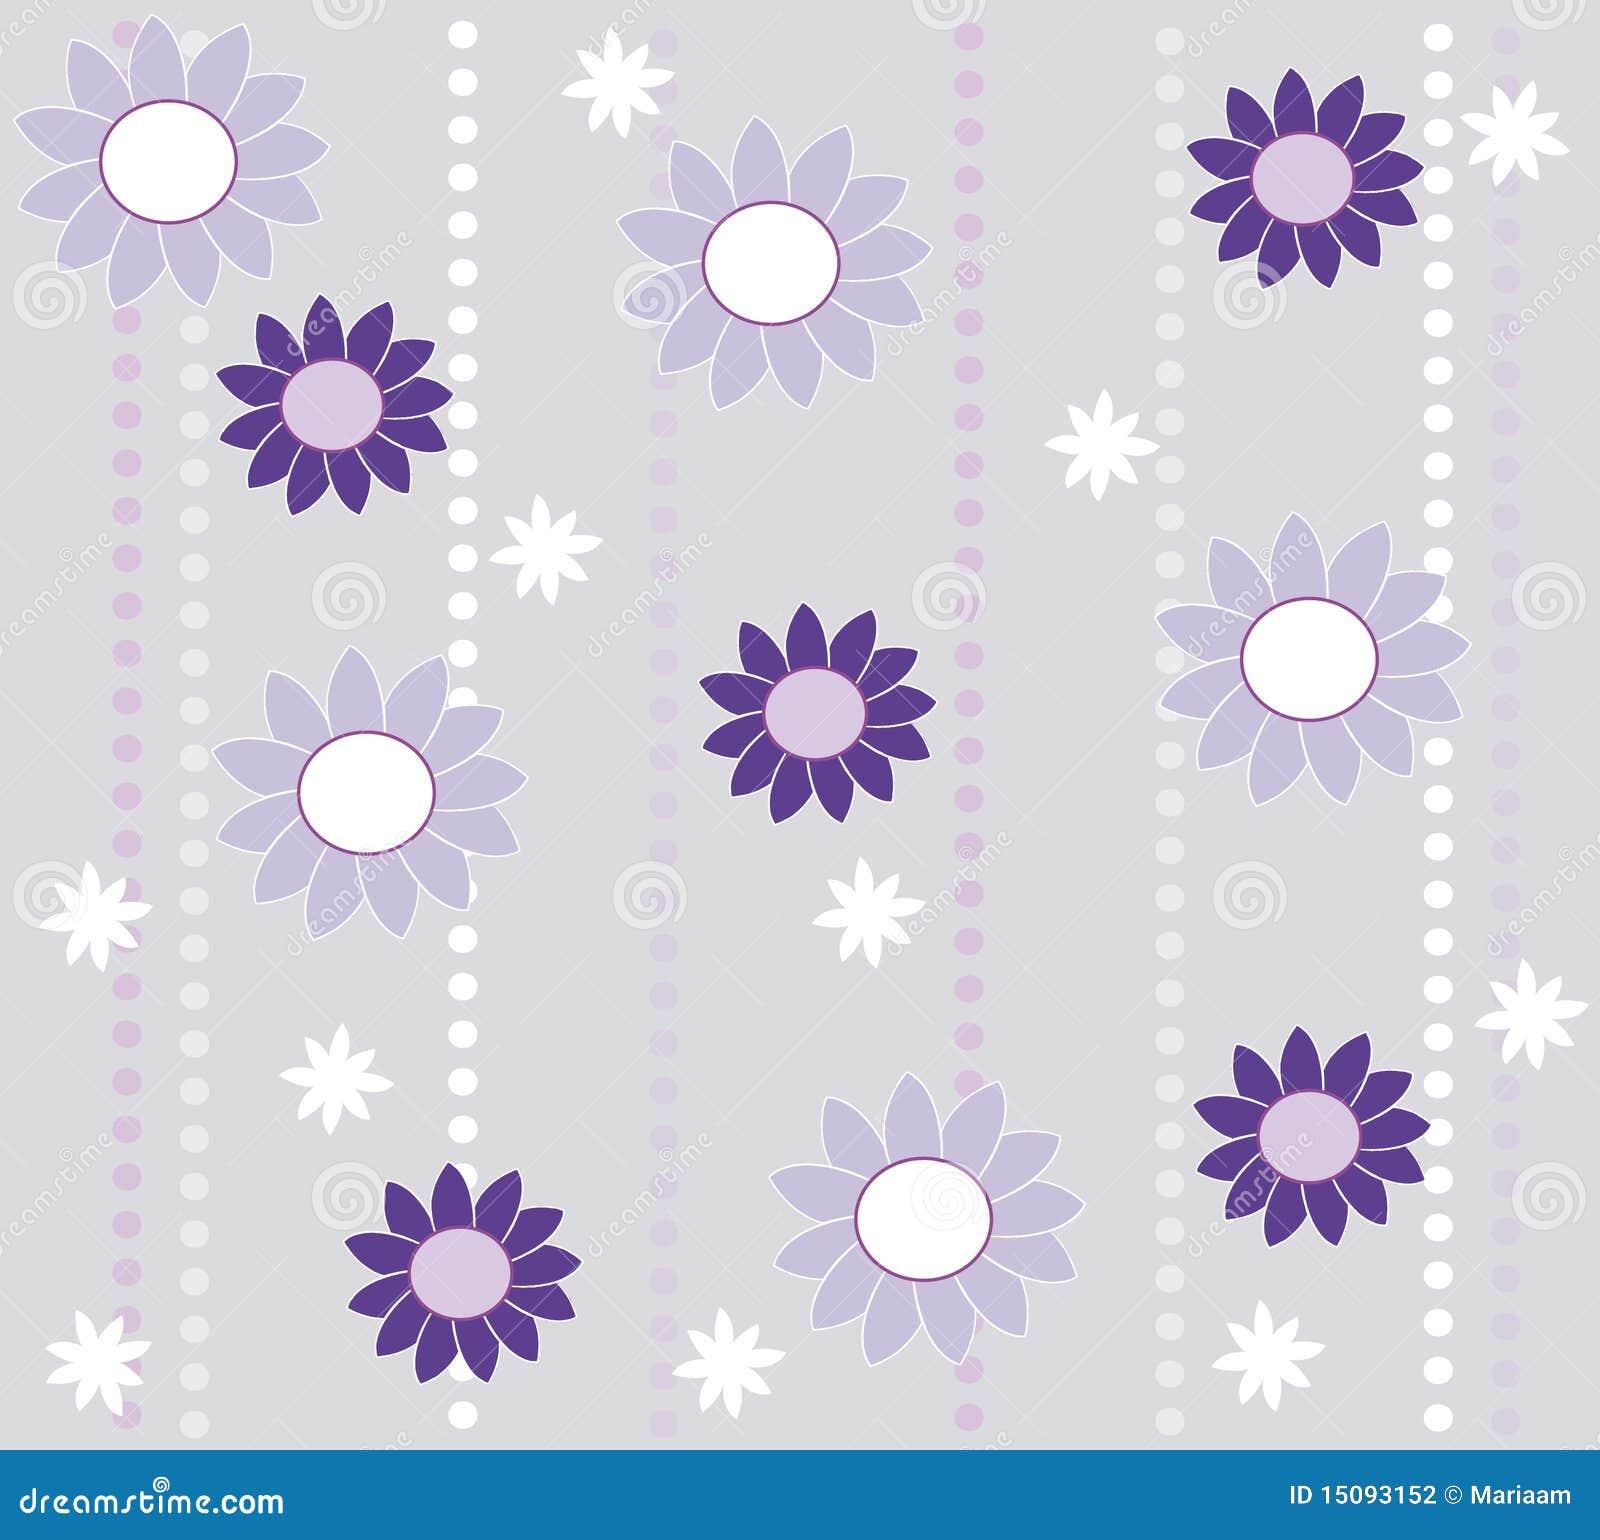 Dise o del papel pintado con las flores fotograf a de - Papel pintado diseno ...